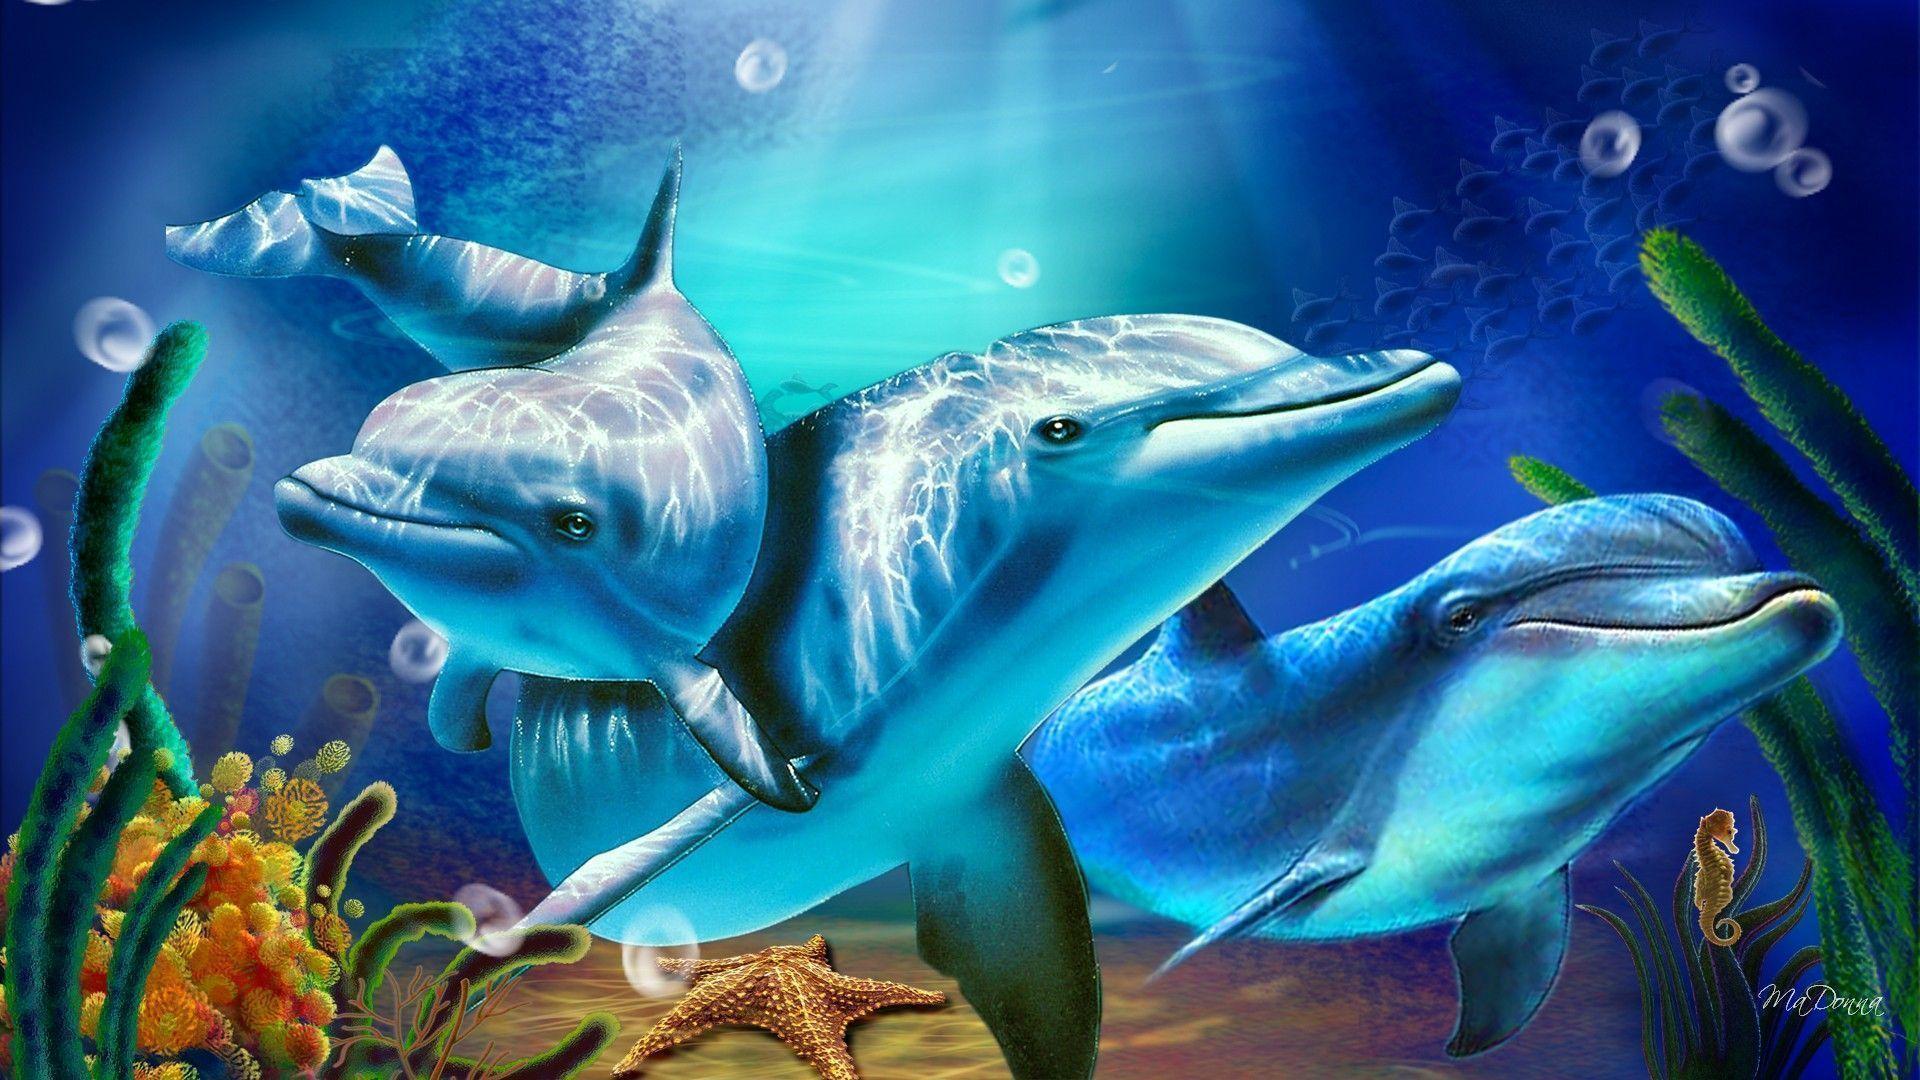 Dolphin Wallpapers HD | fbpapa.